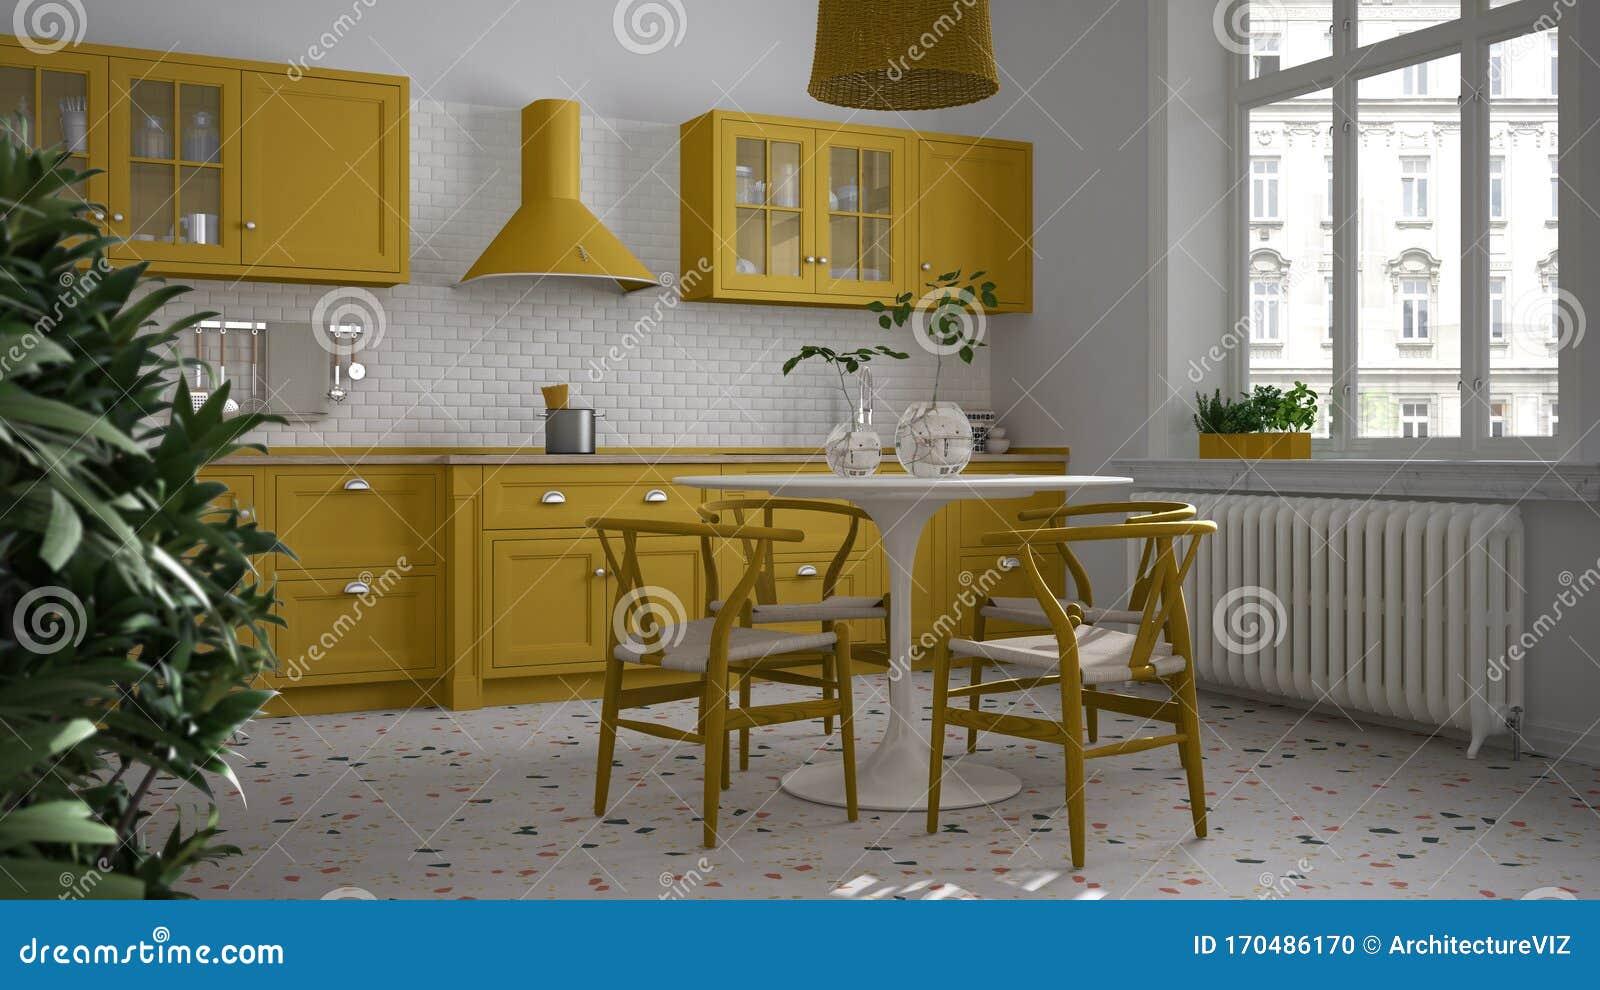 Retro White And Yellow Vintage Kitchen With Terrazzo Marble Floor ...